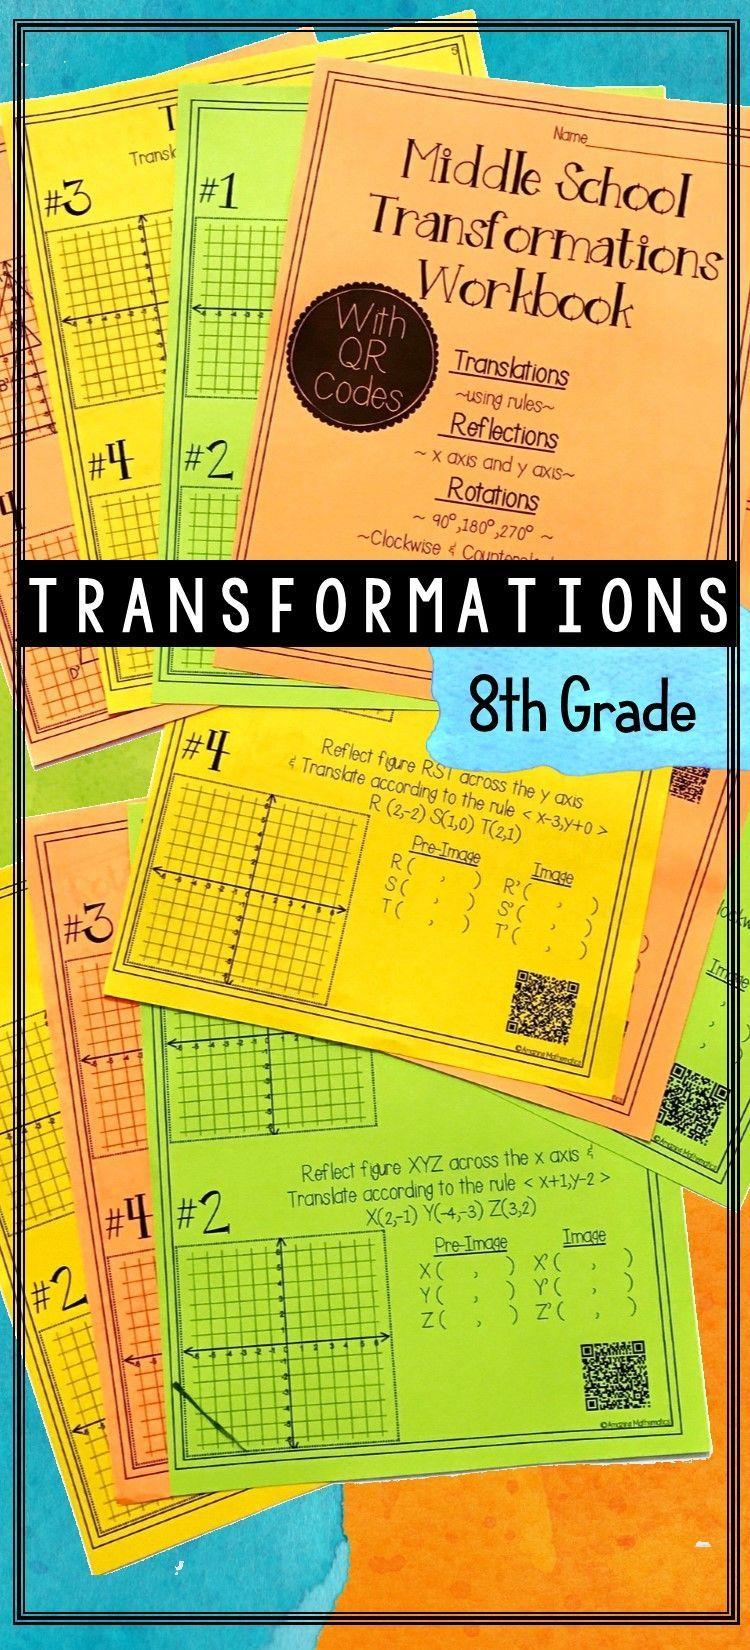 Dilations Translations Worksheet Answers Geometry Translations Rotations Dilations Worksheet In 2020 Gcse Math Transformations Math Gcse Maths Revision